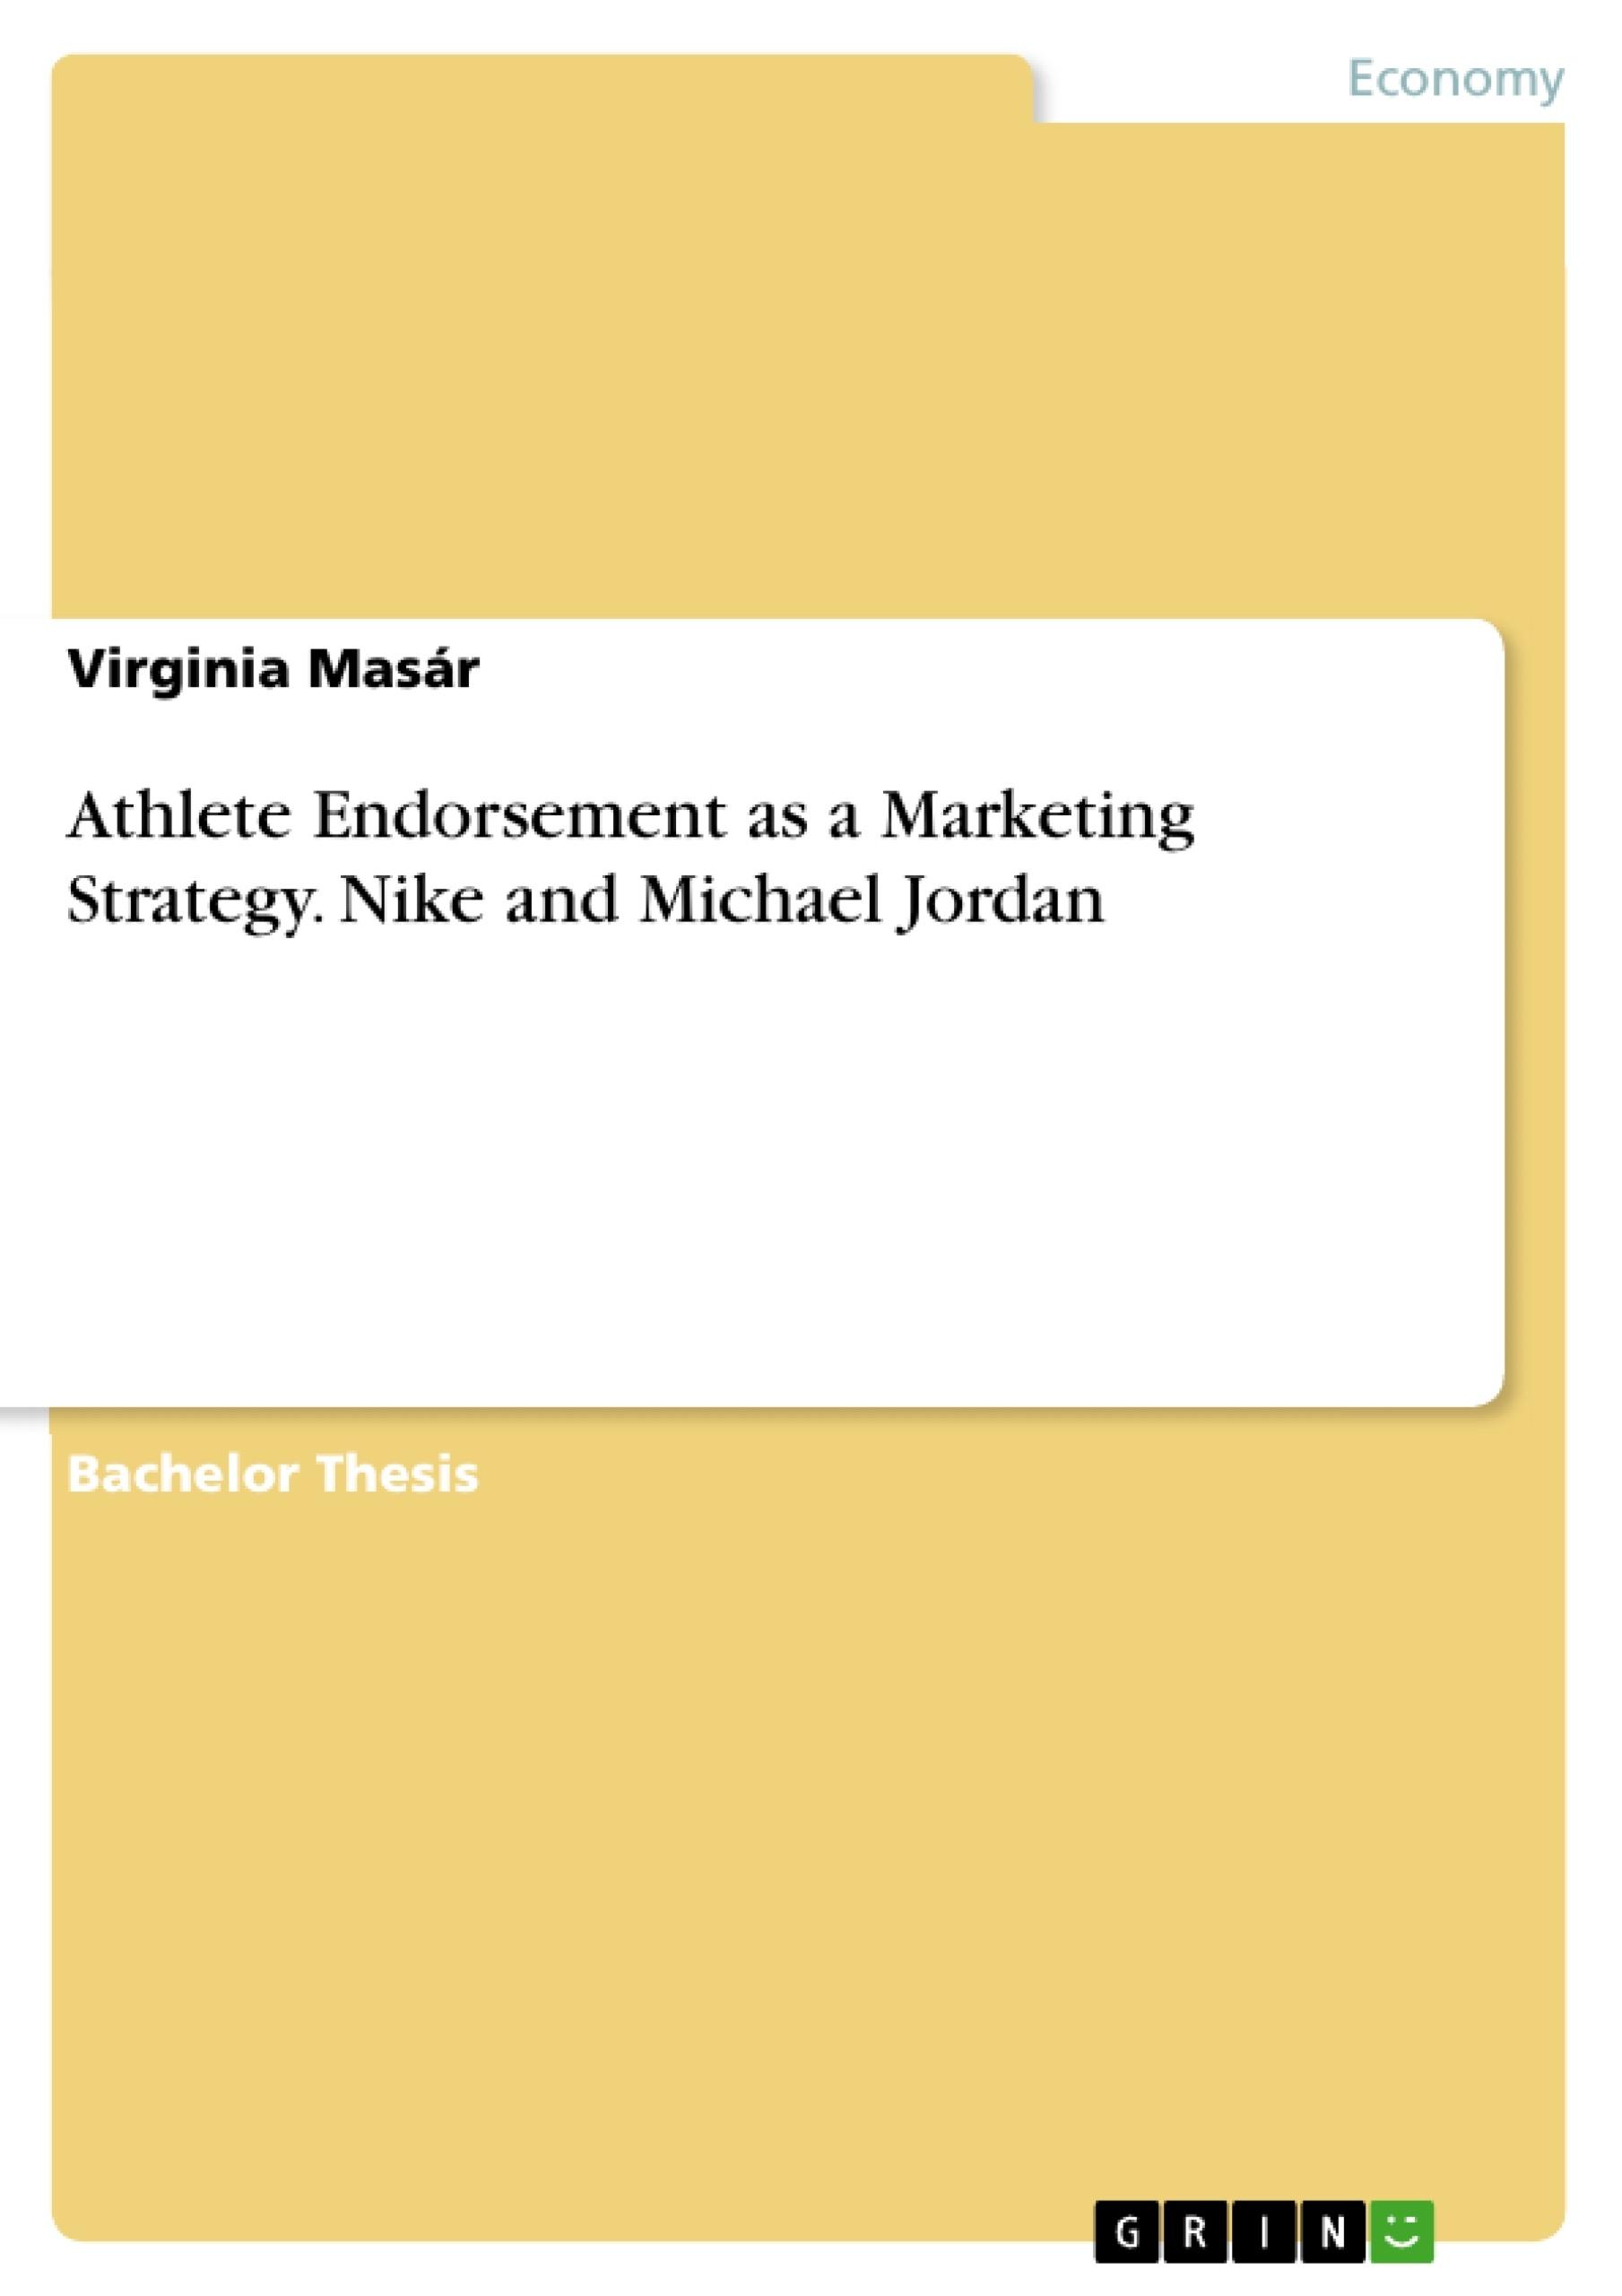 Title: Athlete Endorsement as a Marketing Strategy. Nike and Michael Jordan